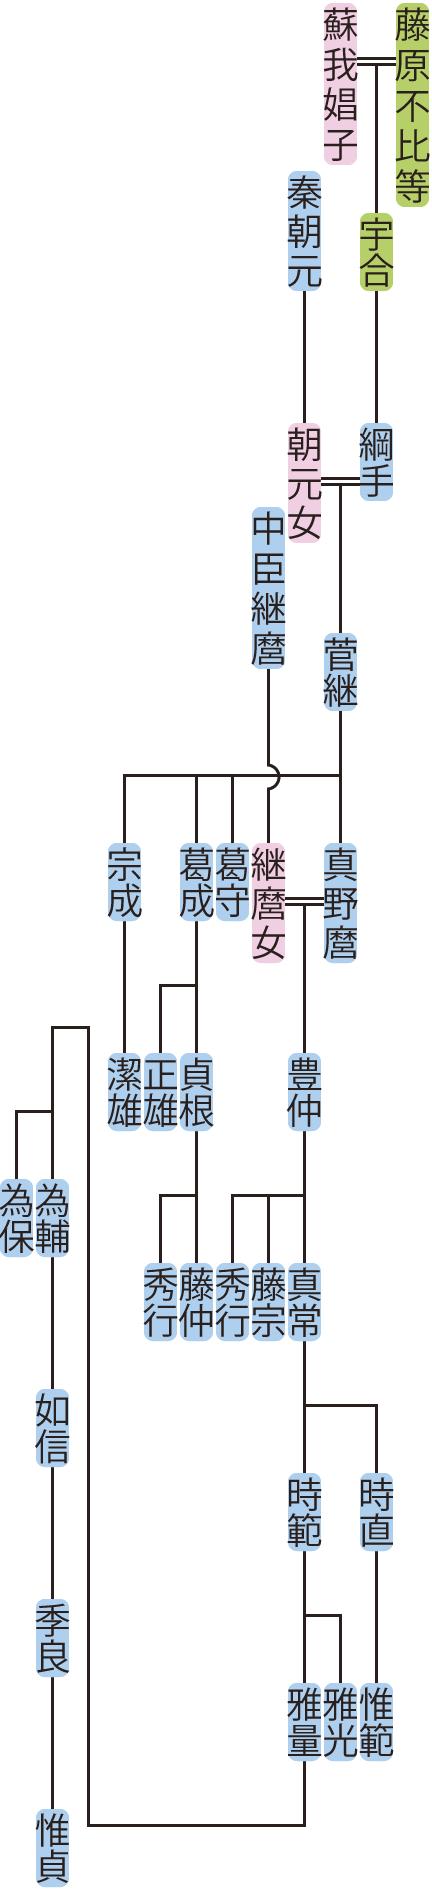 藤原綱手の系図